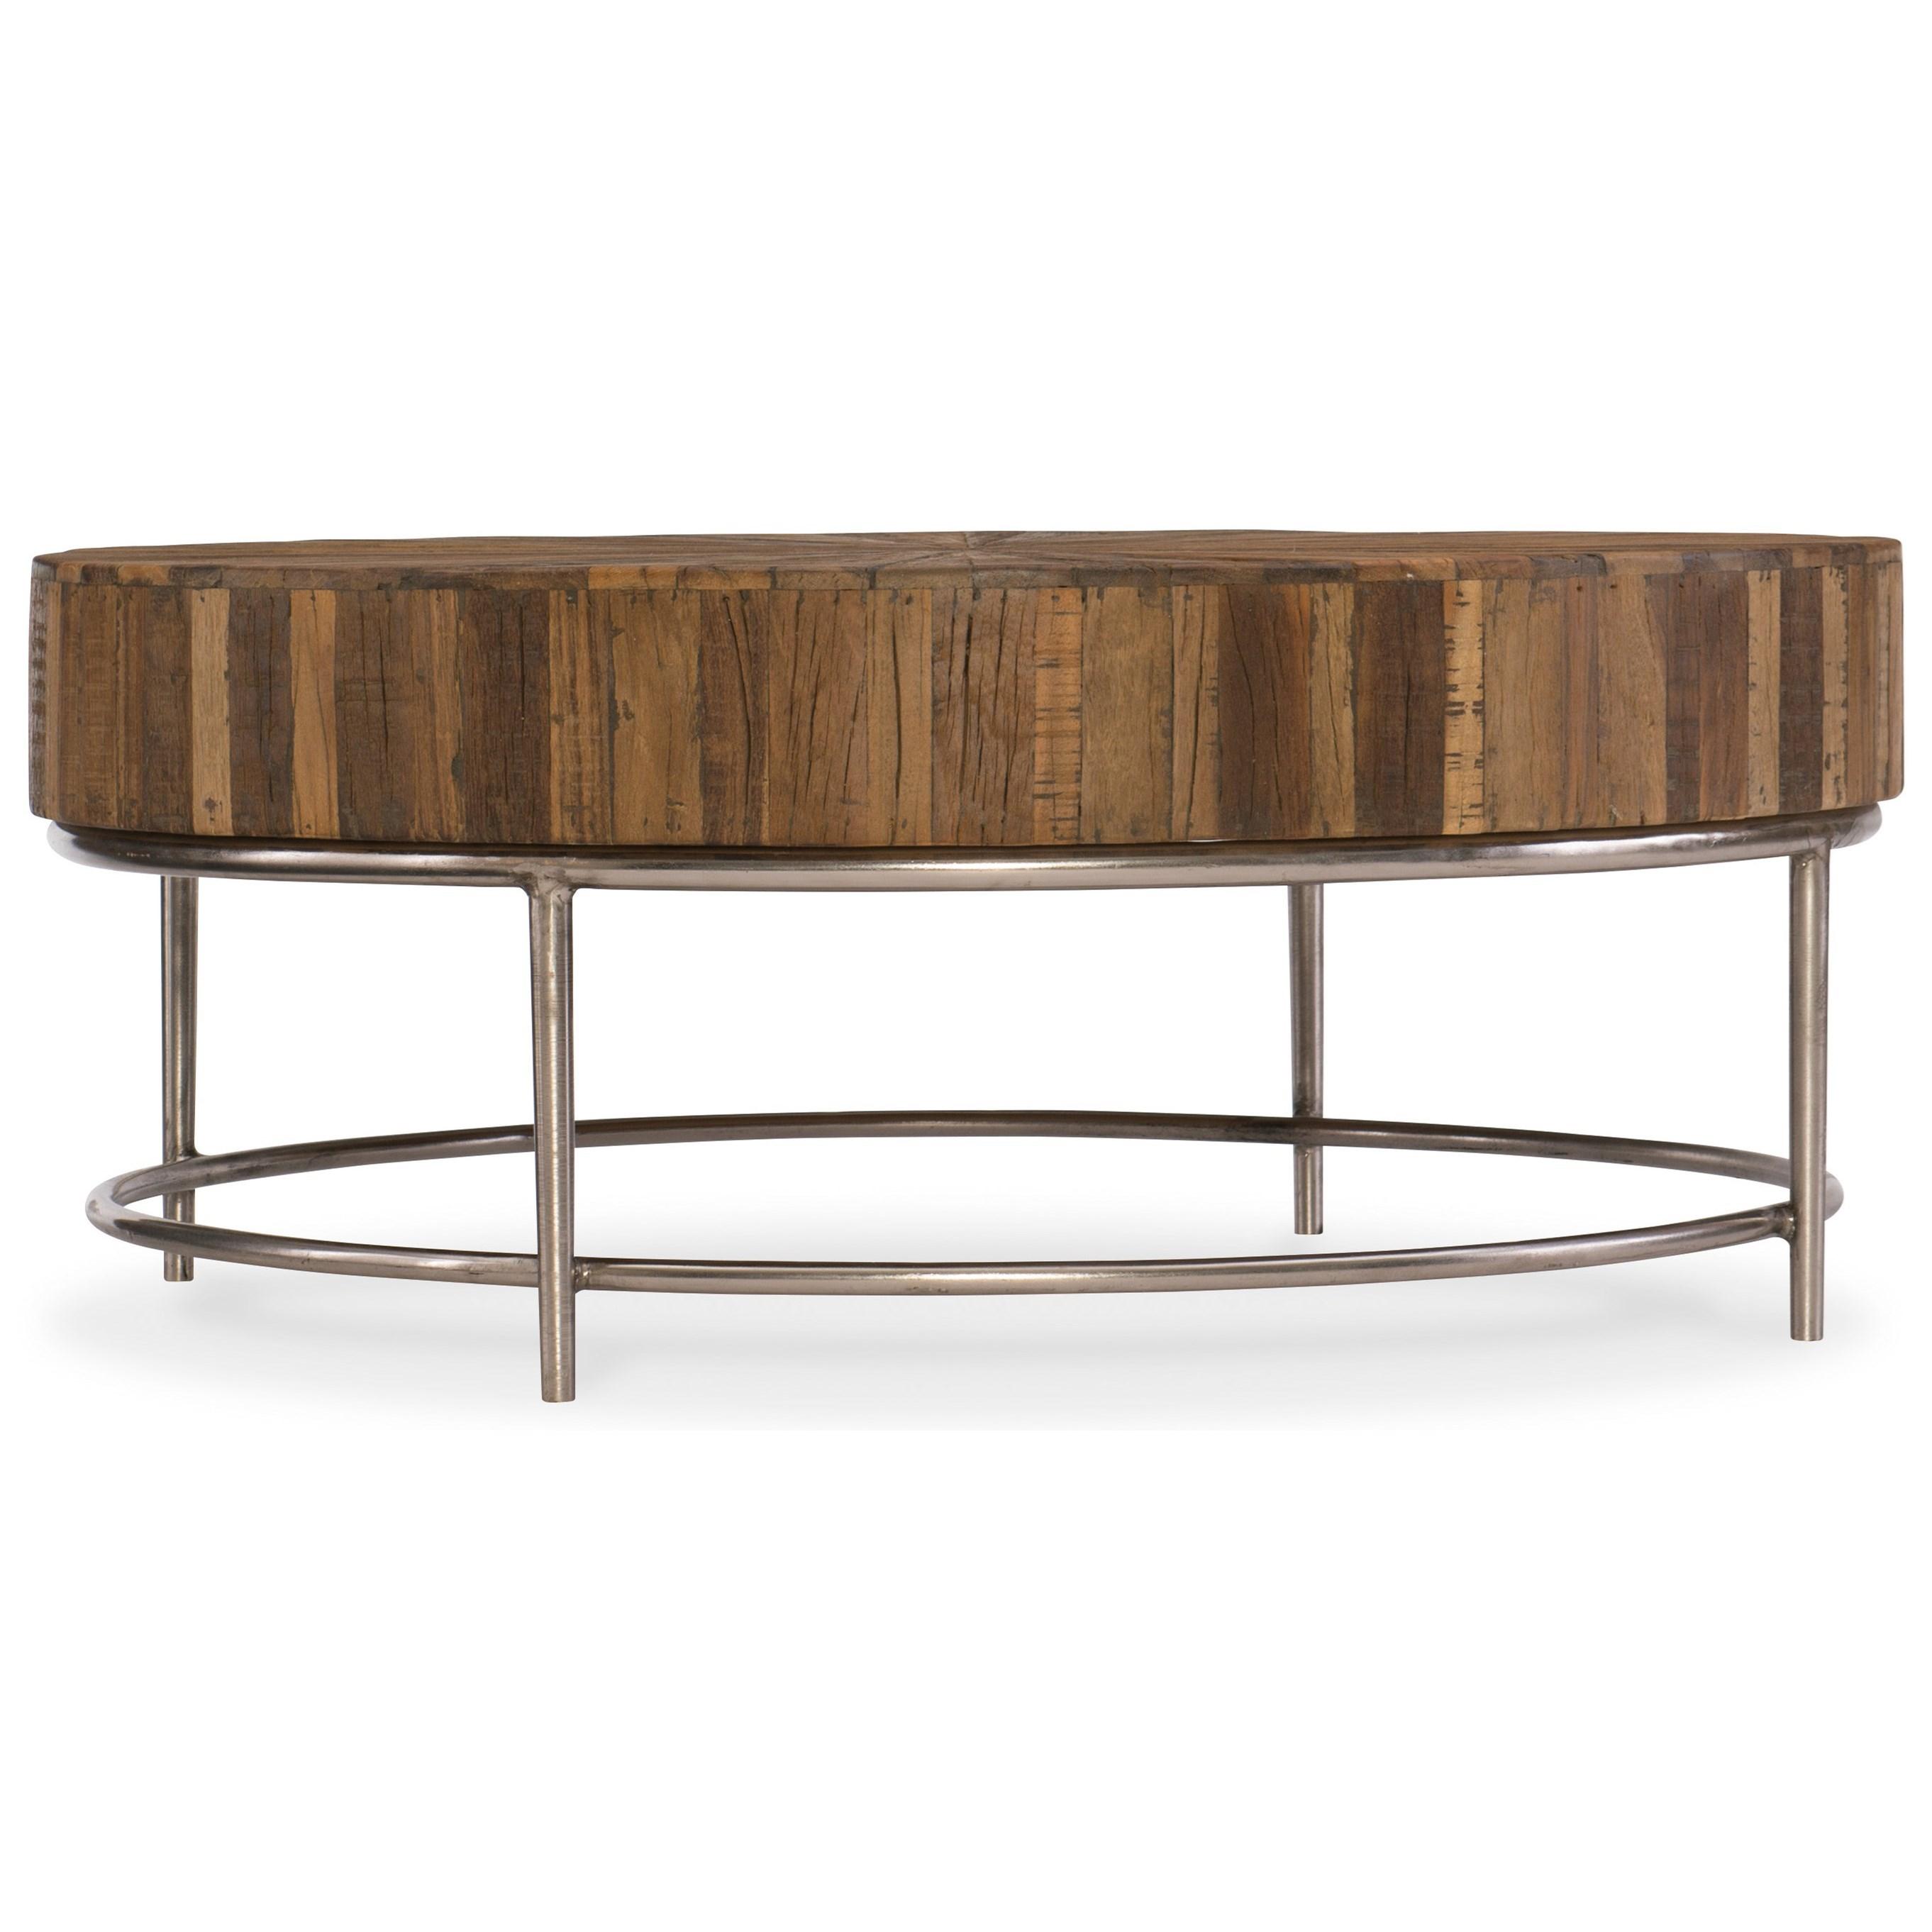 L'Usine Cocktail Table by Hooker Furniture at Baer's Furniture